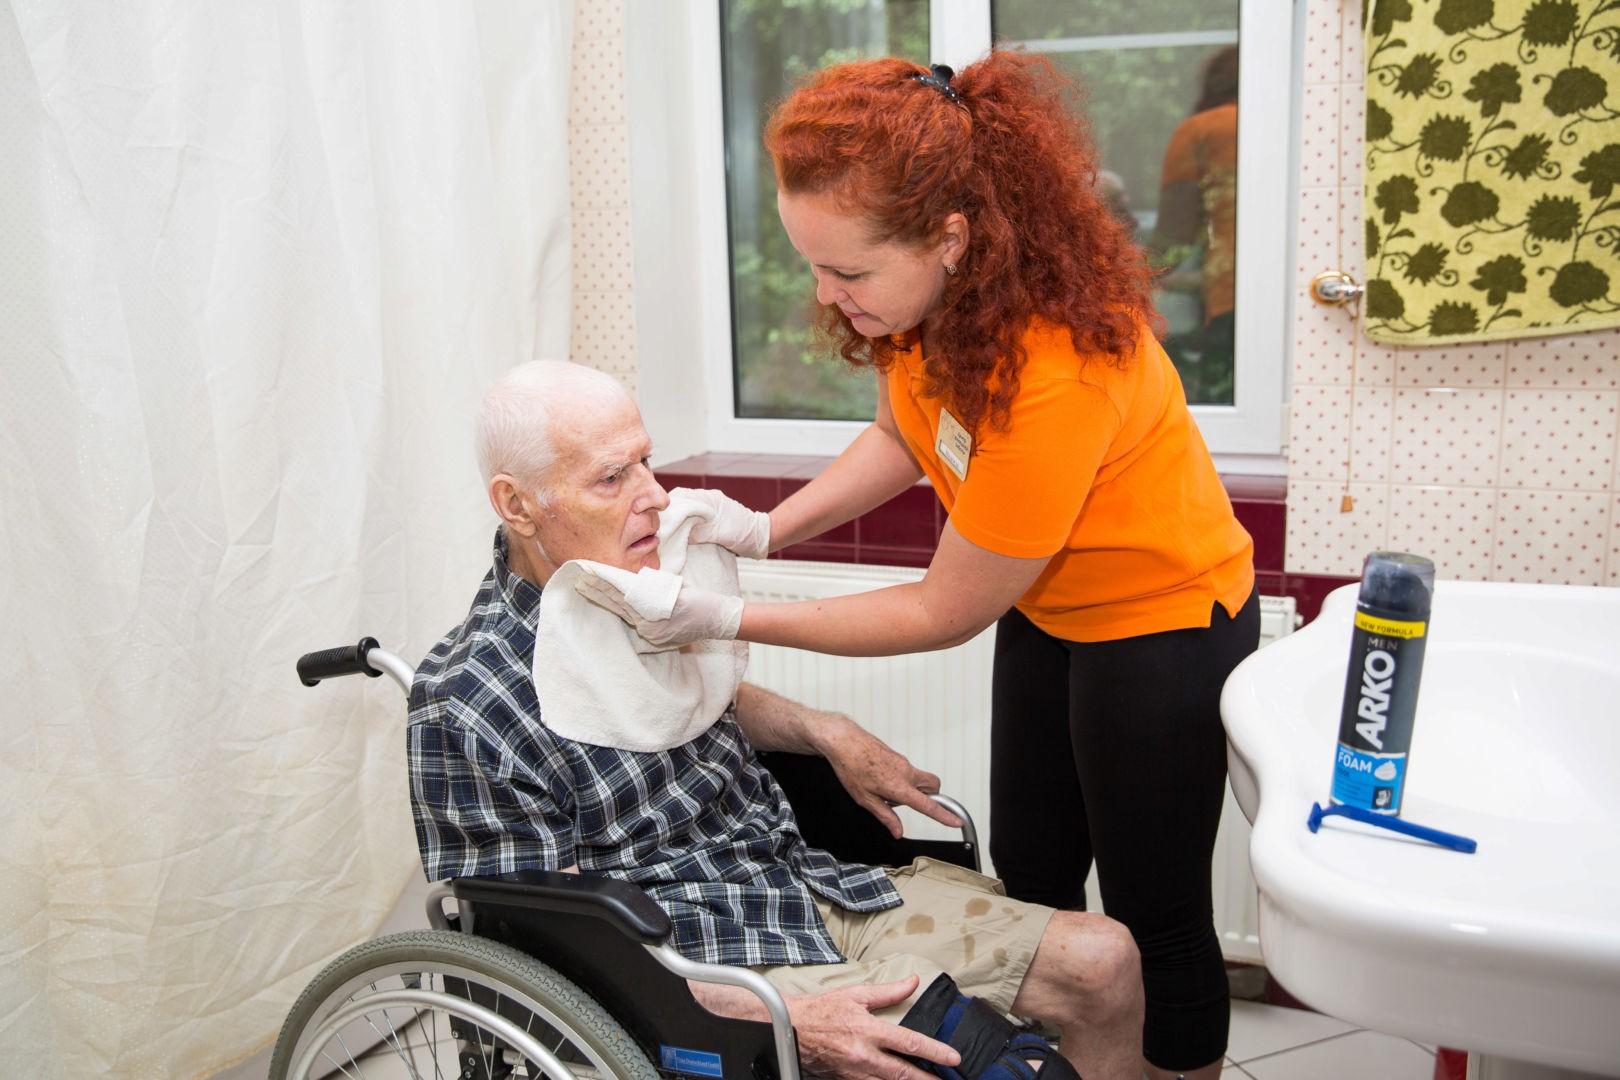 Сотрудница бреет лицо мужчине в инвалидной каляске